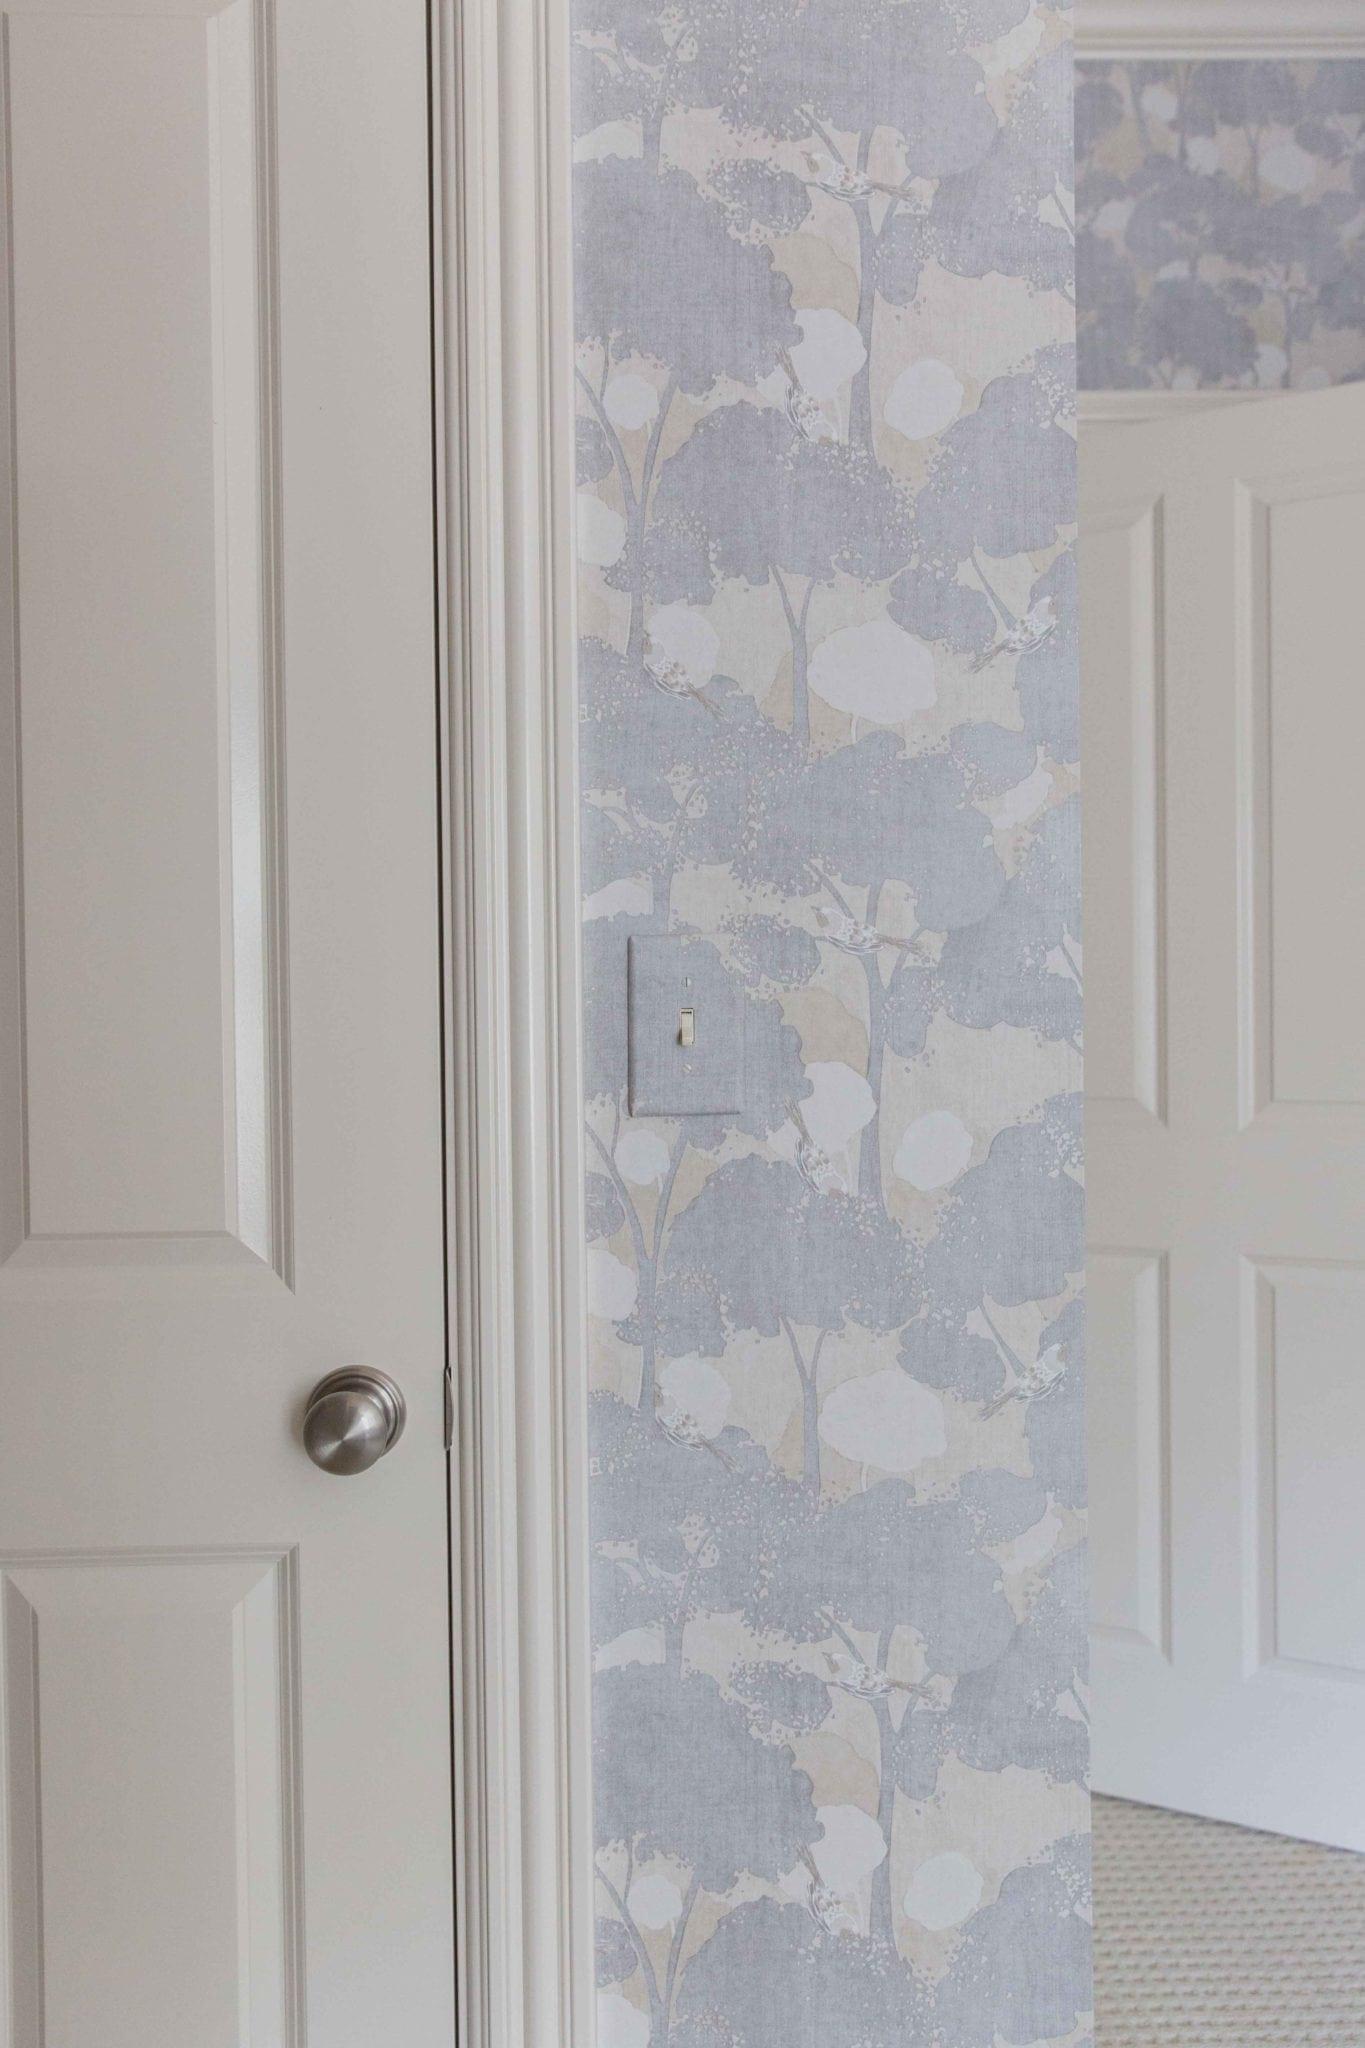 Purple wallpaper designs by Calico. Bedroom makeover ideas.